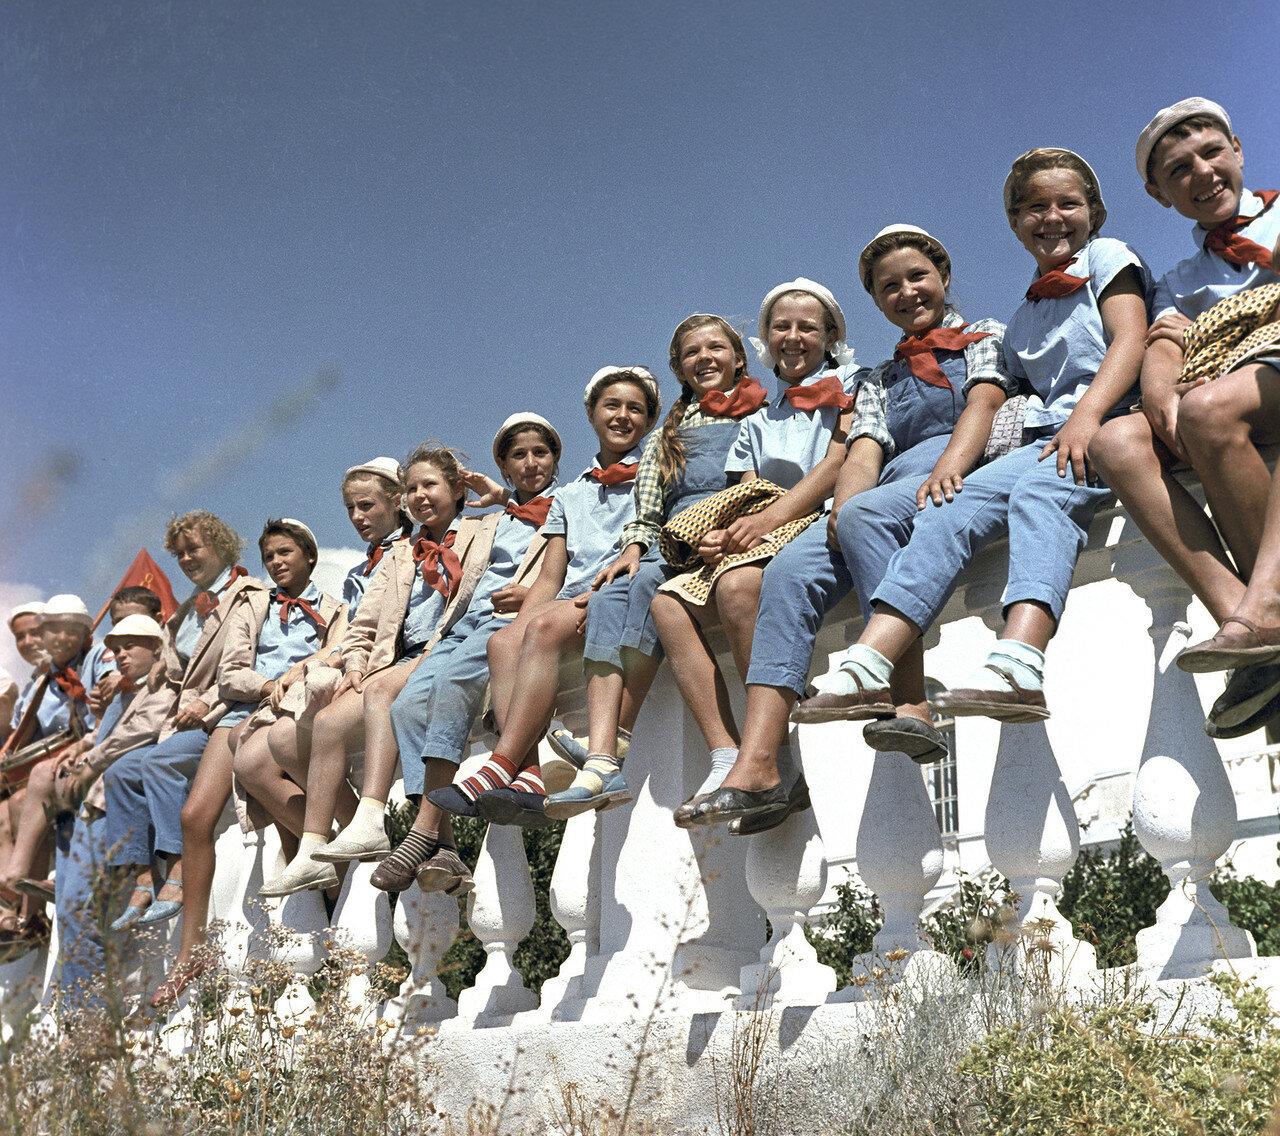 Советские дети в Артеке (13 ФОТО)